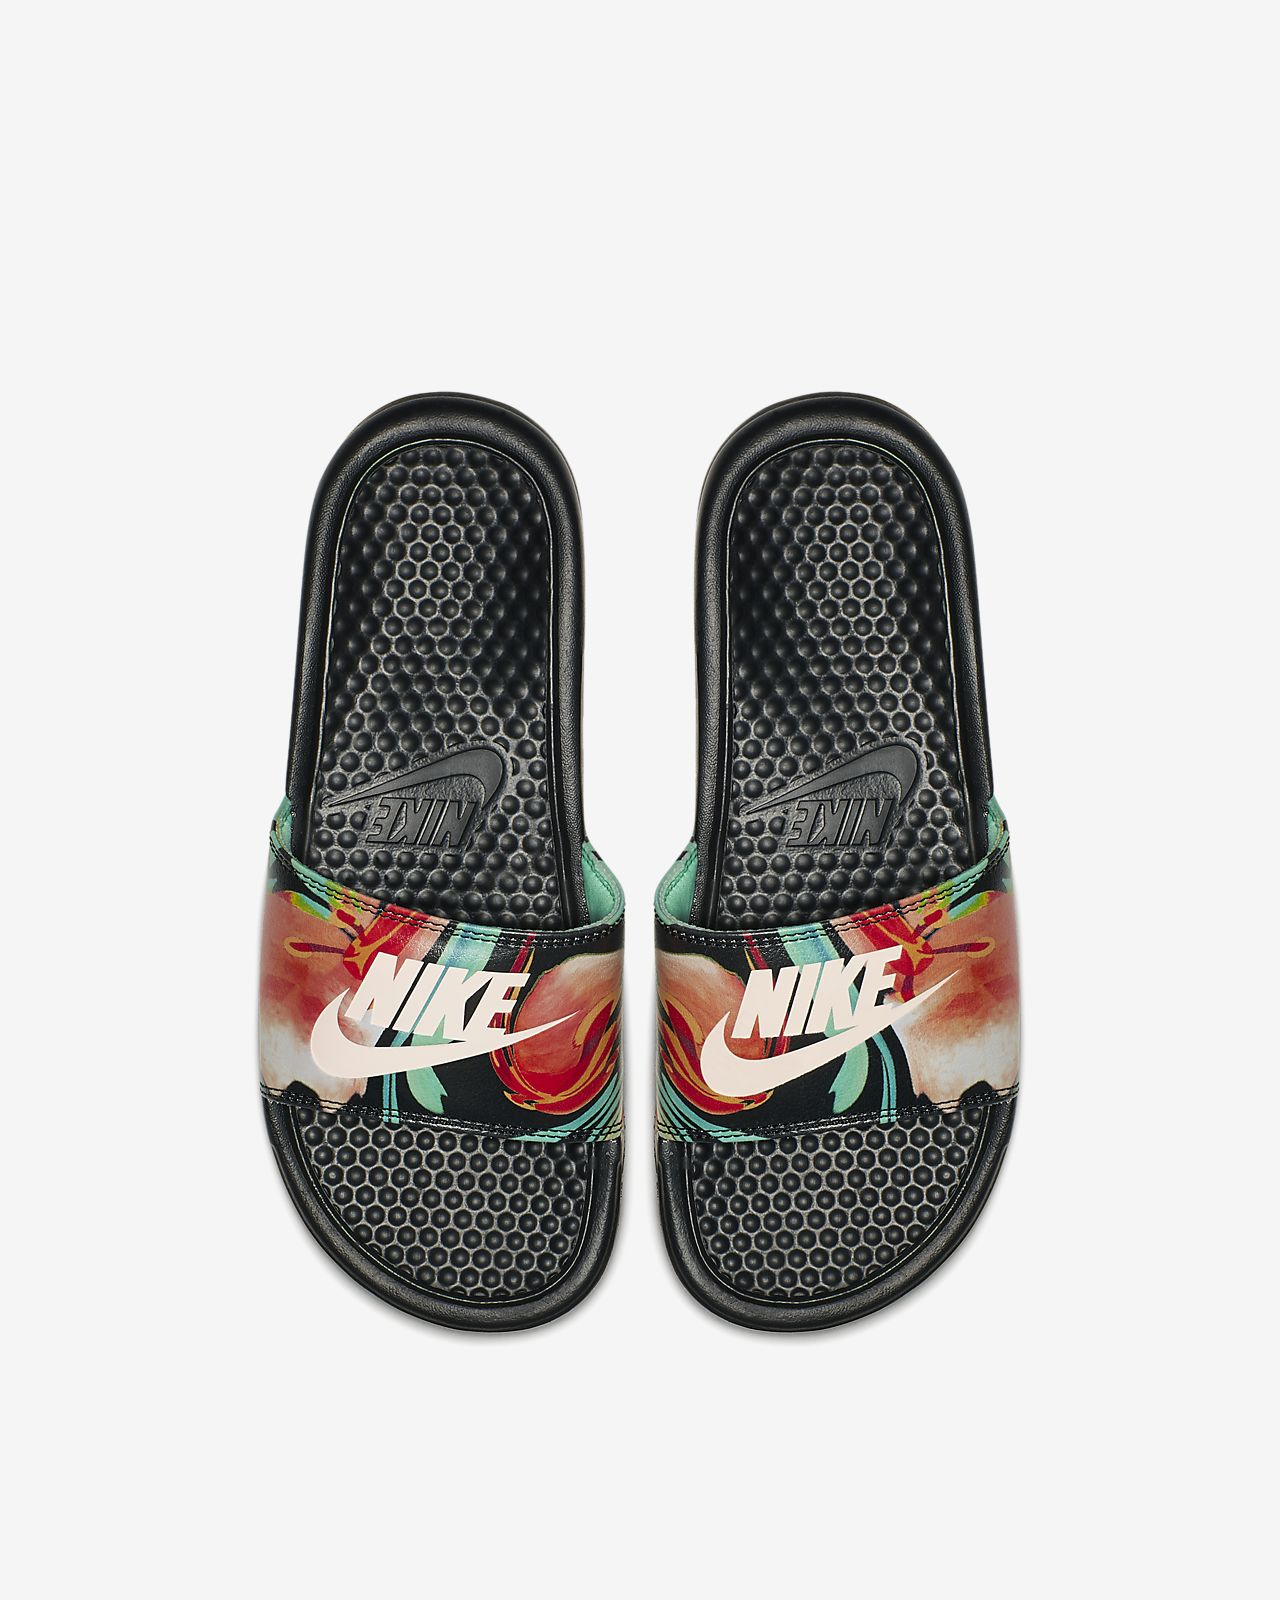 5f5879b7d4a6 Nike Benassi JDI Floral Women s Slide. Nike.com GB